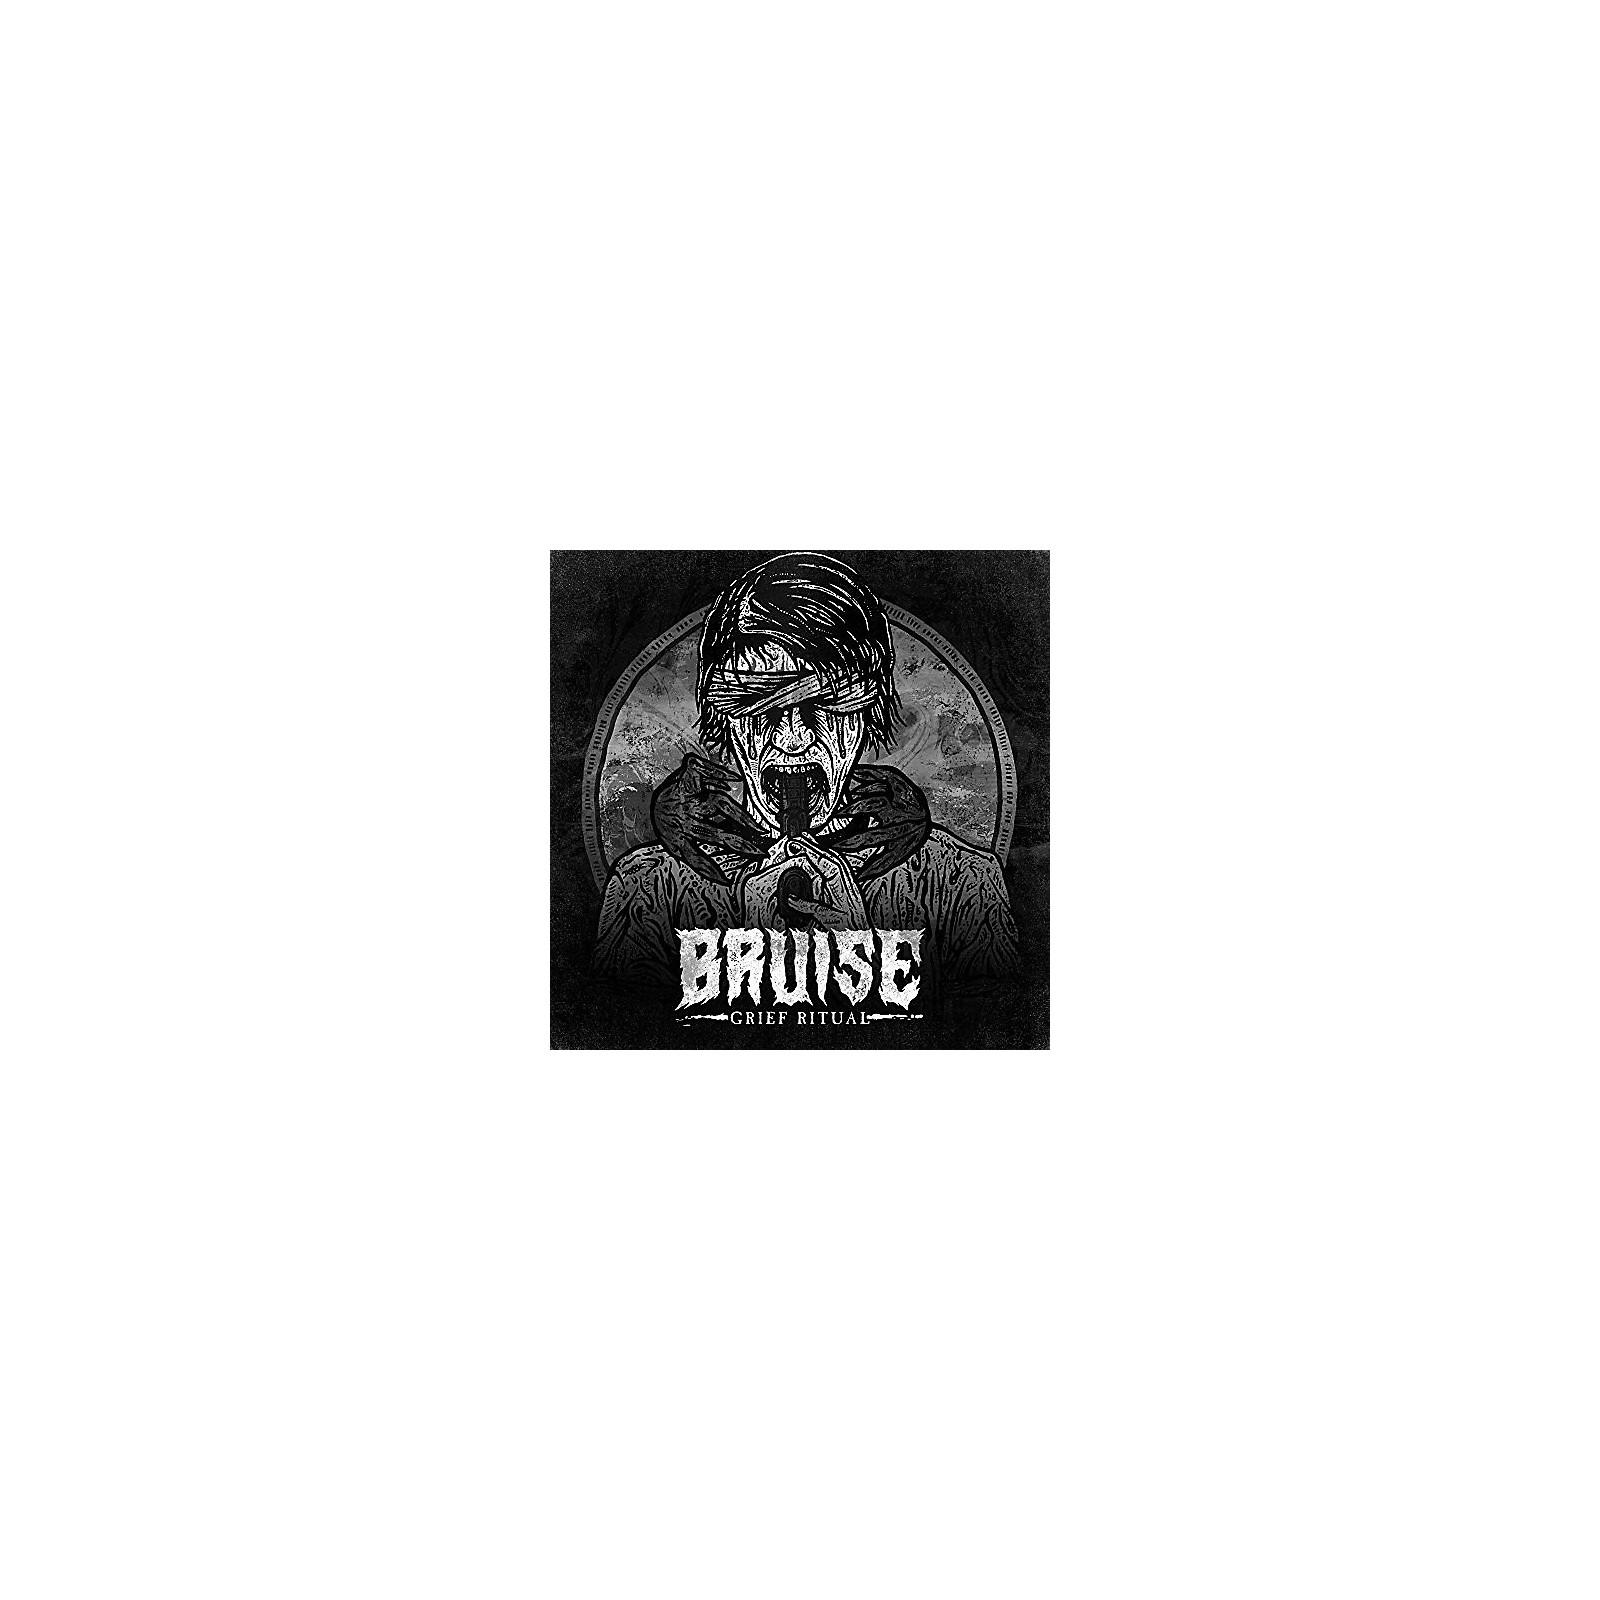 Alliance Bruise - Grief Ritual